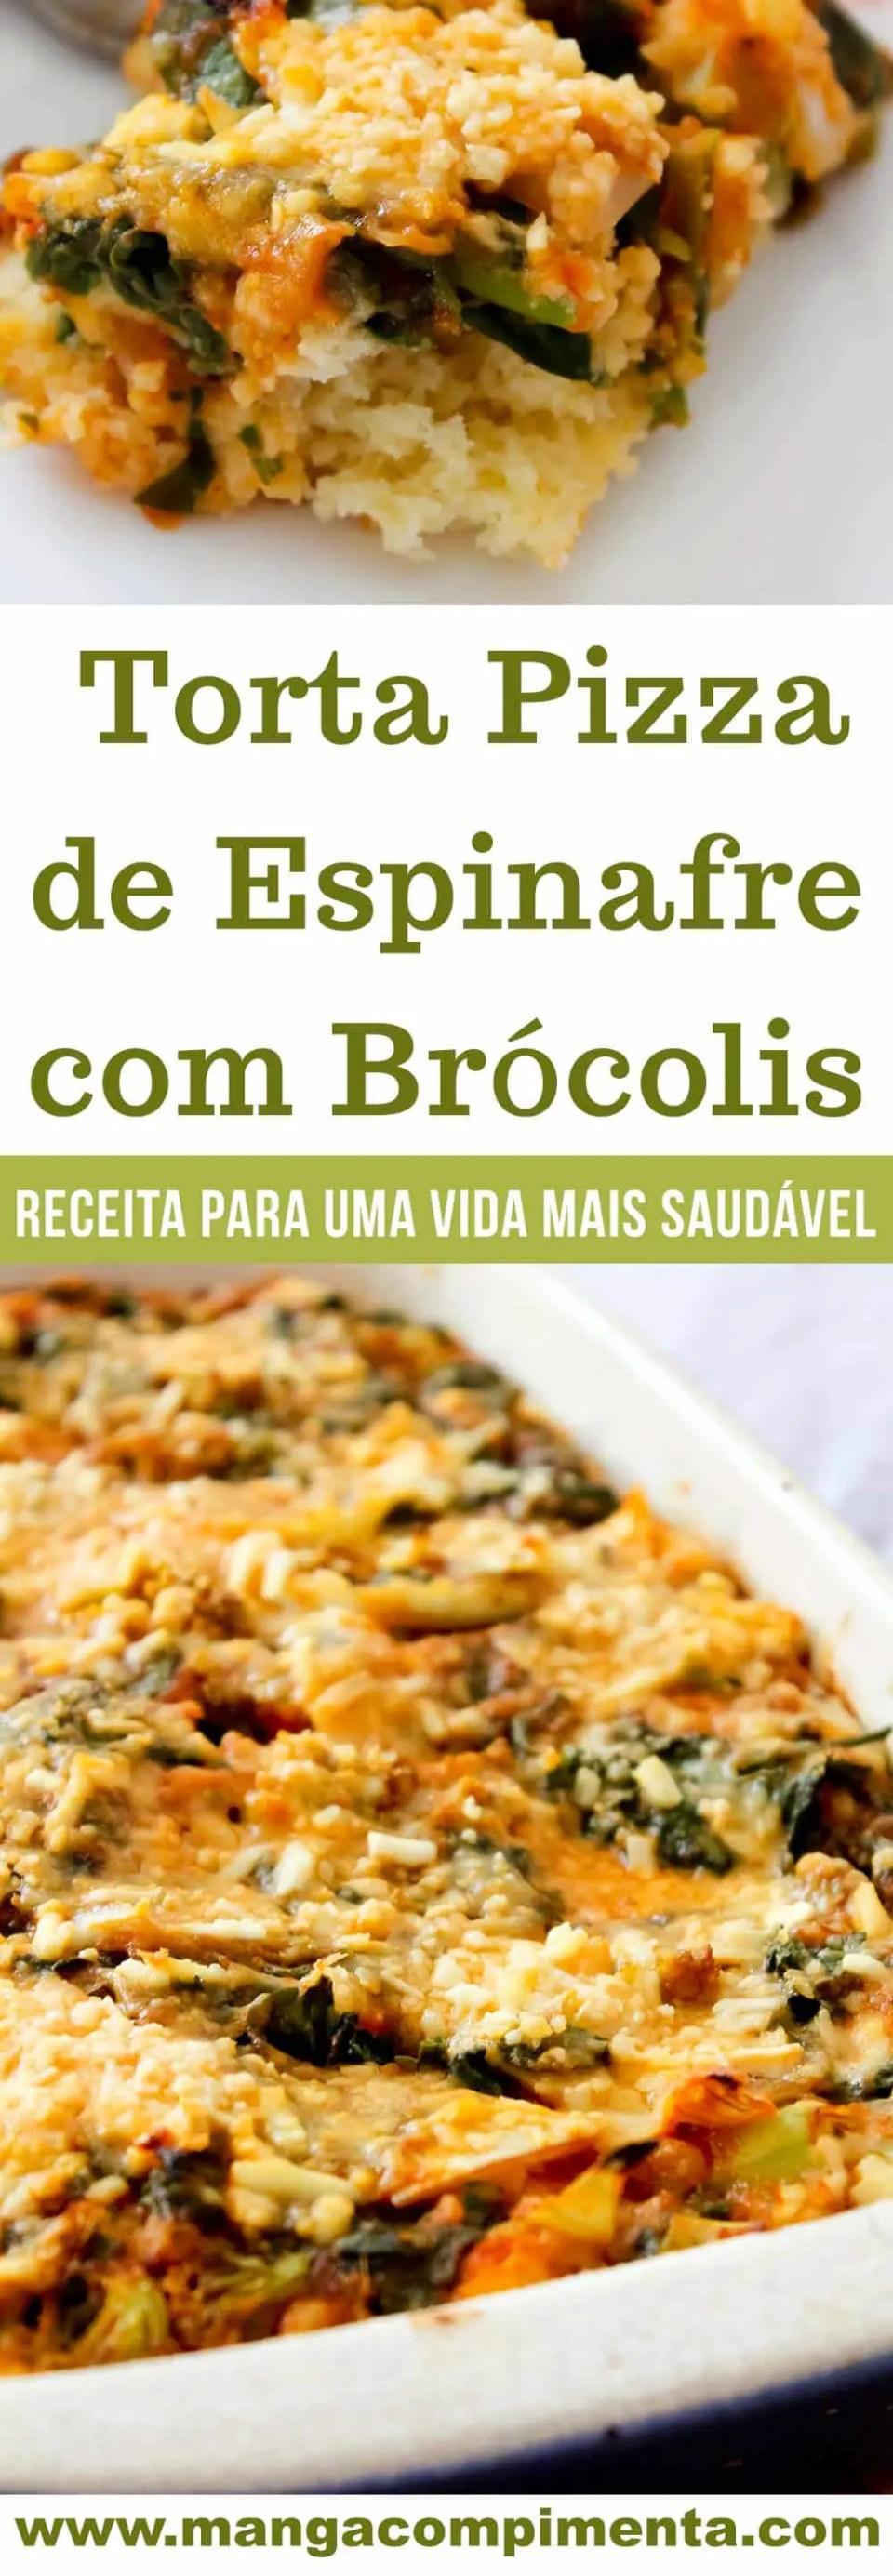 Torta Pizza de Espinafre com Brócolis - um prato delicioso para o lanche da tarde!